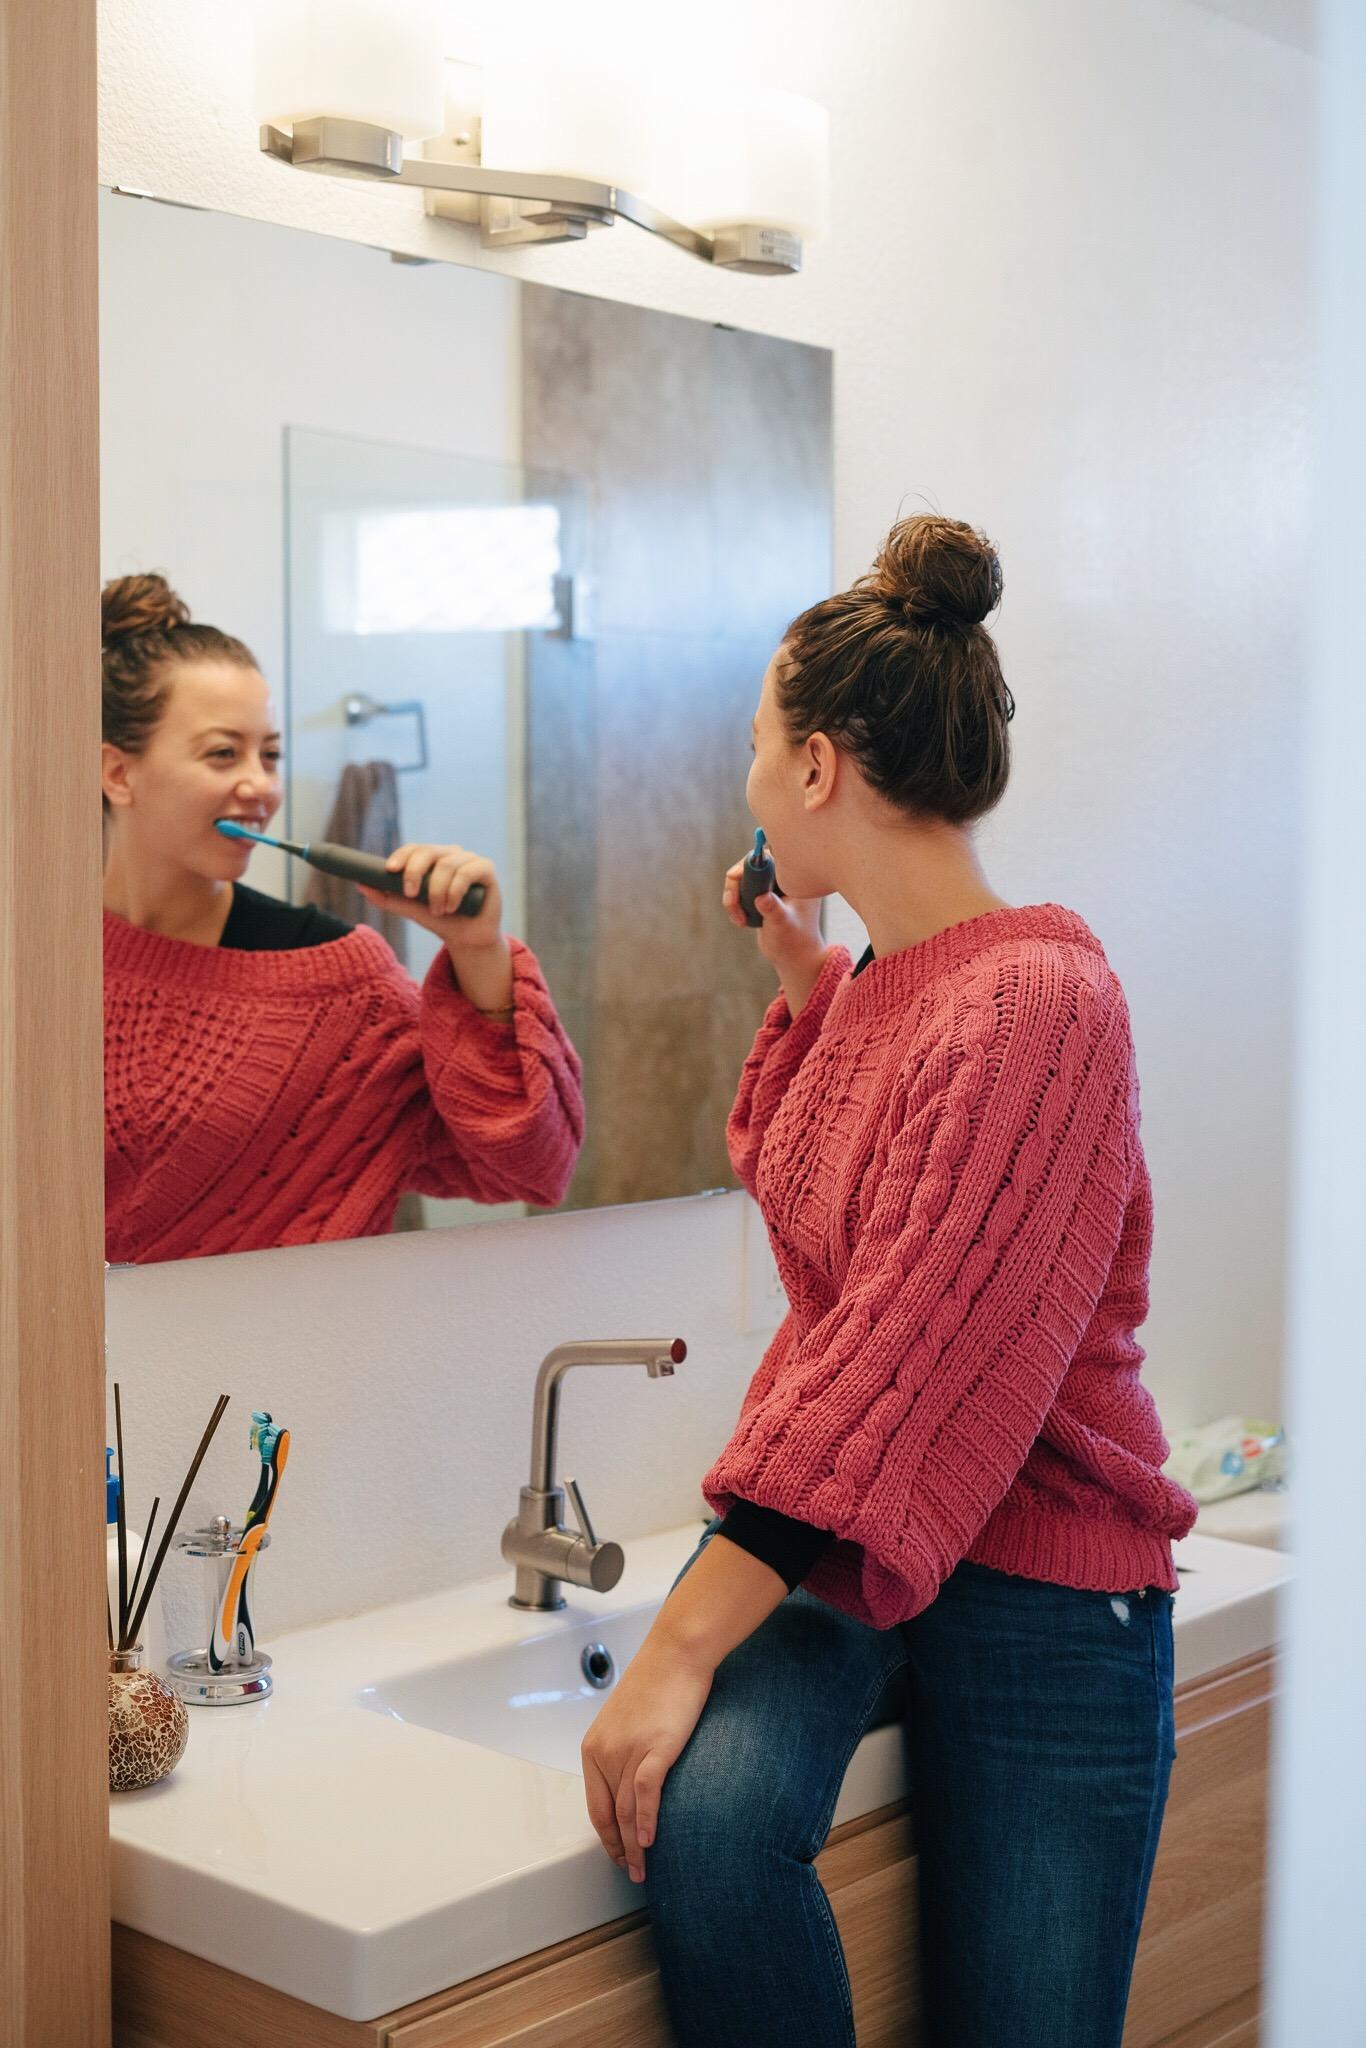 CariPRO Ultrasonic Electronic Toothbrush